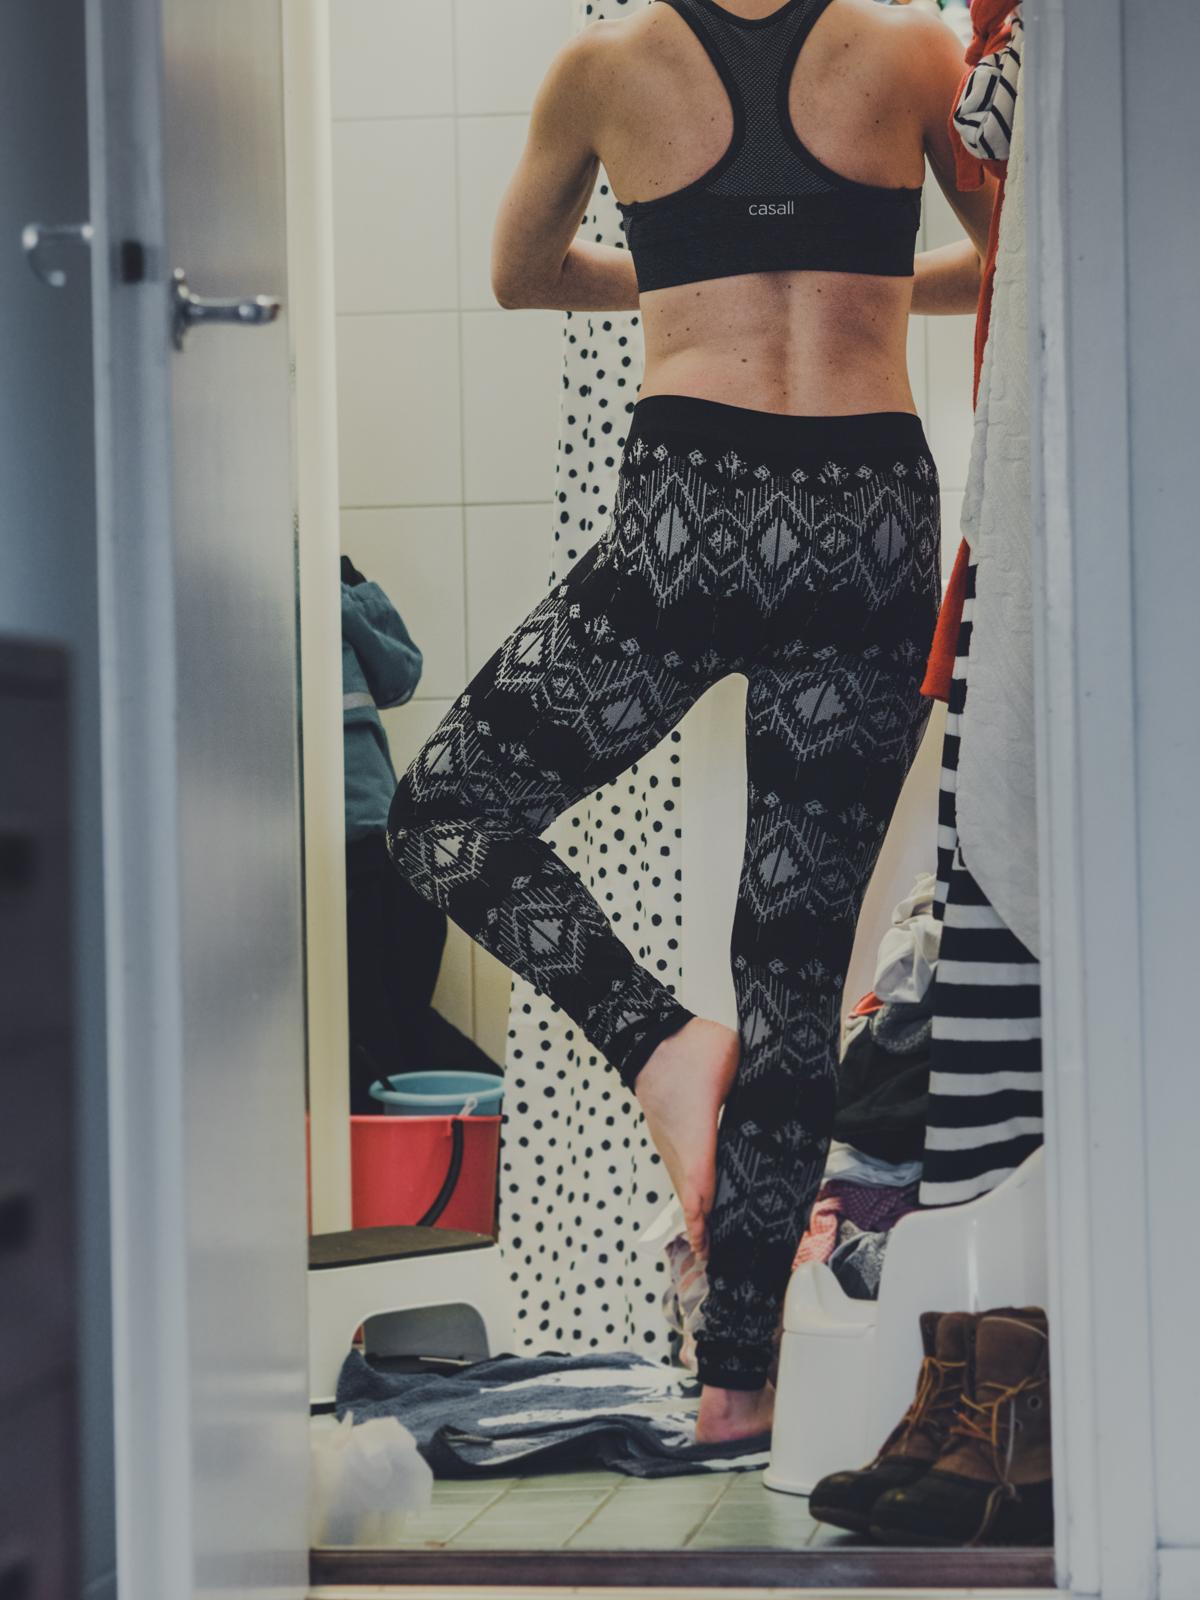 Treenaakotona.com I Kotijumppa I Treeni I Jumppa ohjeet i Liikunta I Hyvinvointi I Jooga I Pilates I Yoga I Wellbeing I Home workout